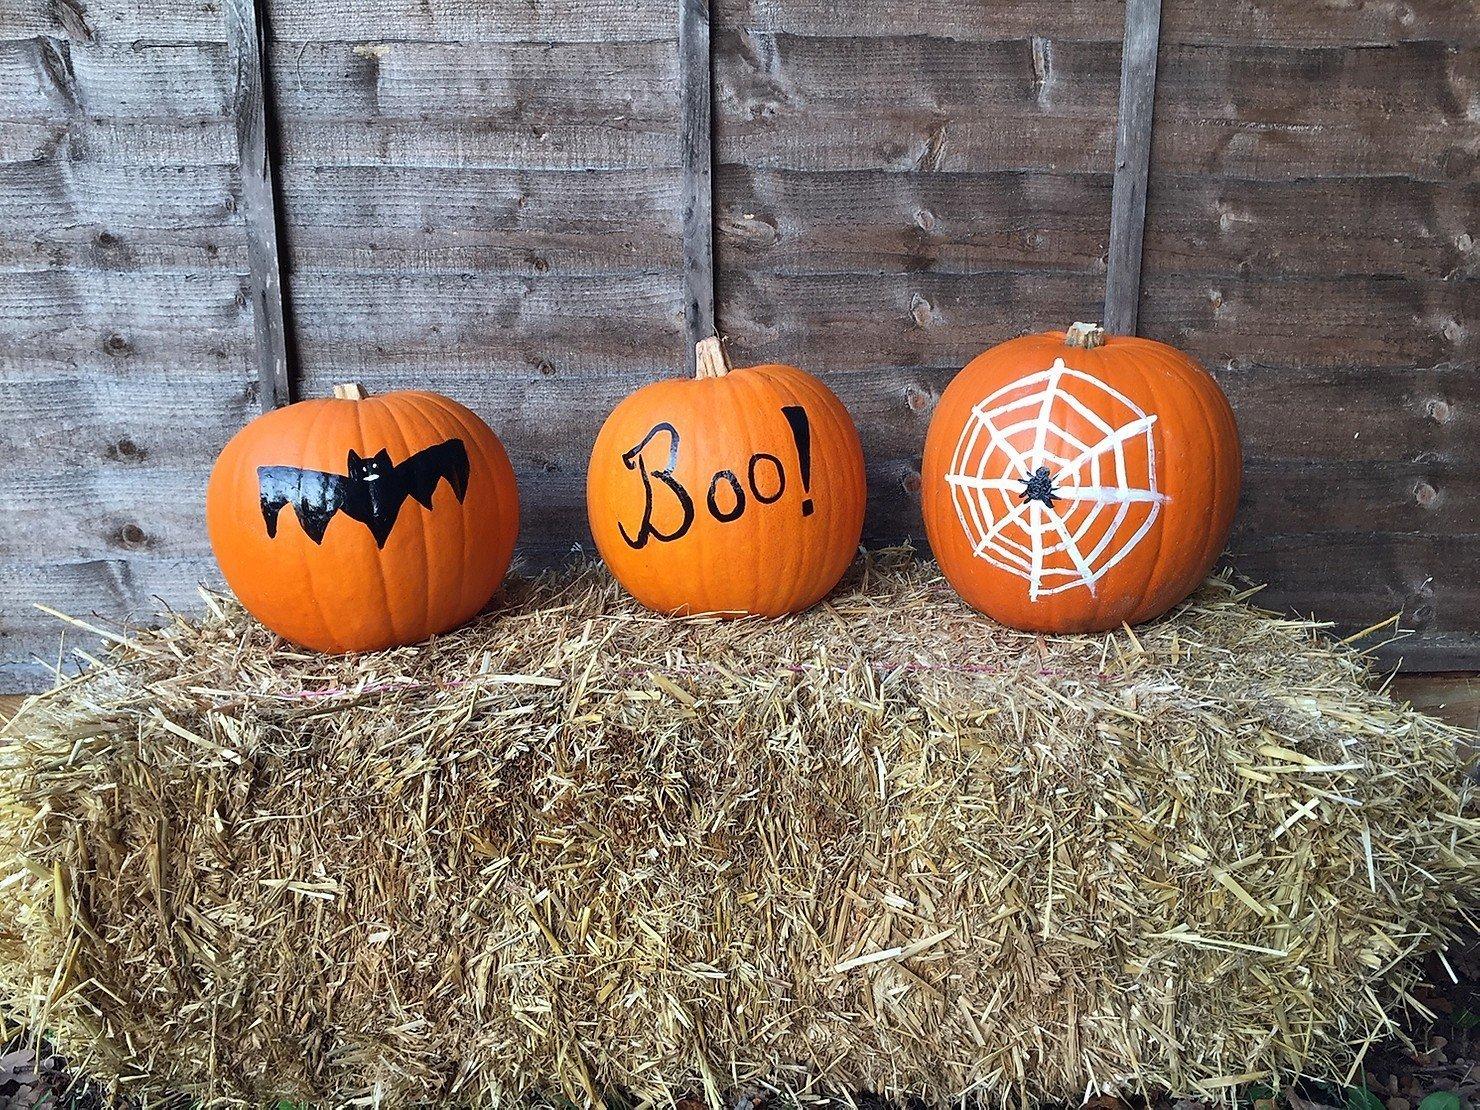 Pick Your Own Pumpkin & Pumpkin Carving Events